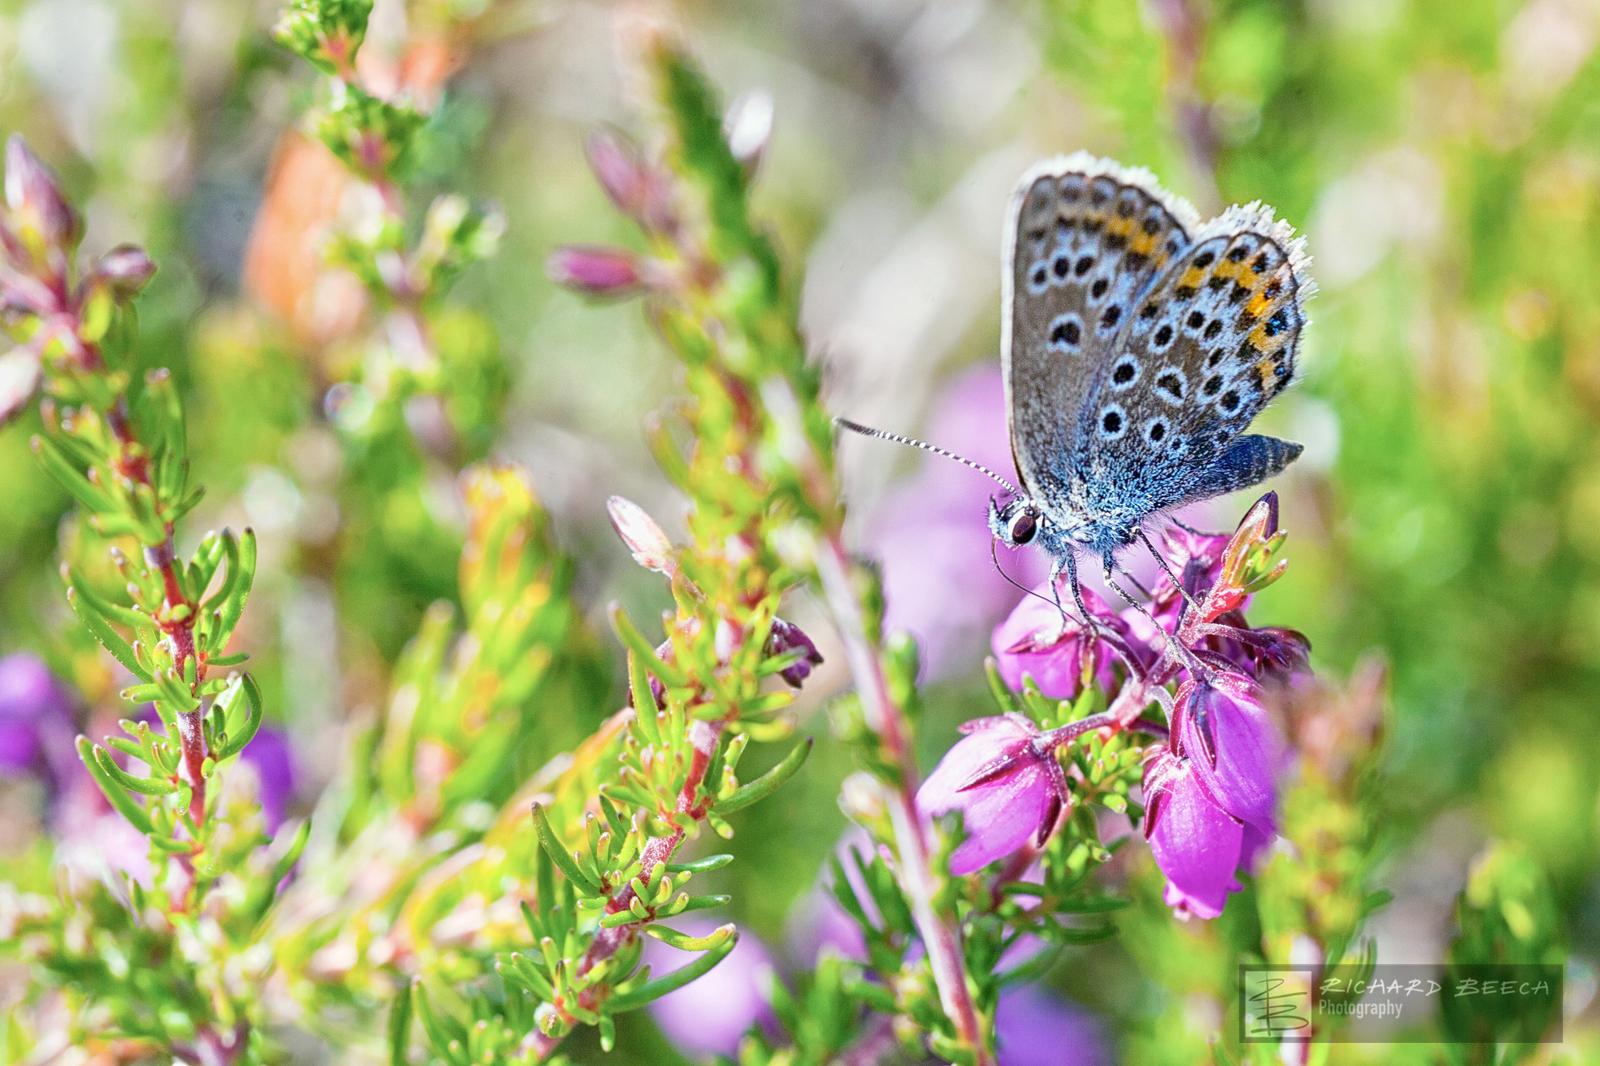 Silver-Studded Blue on Heathland